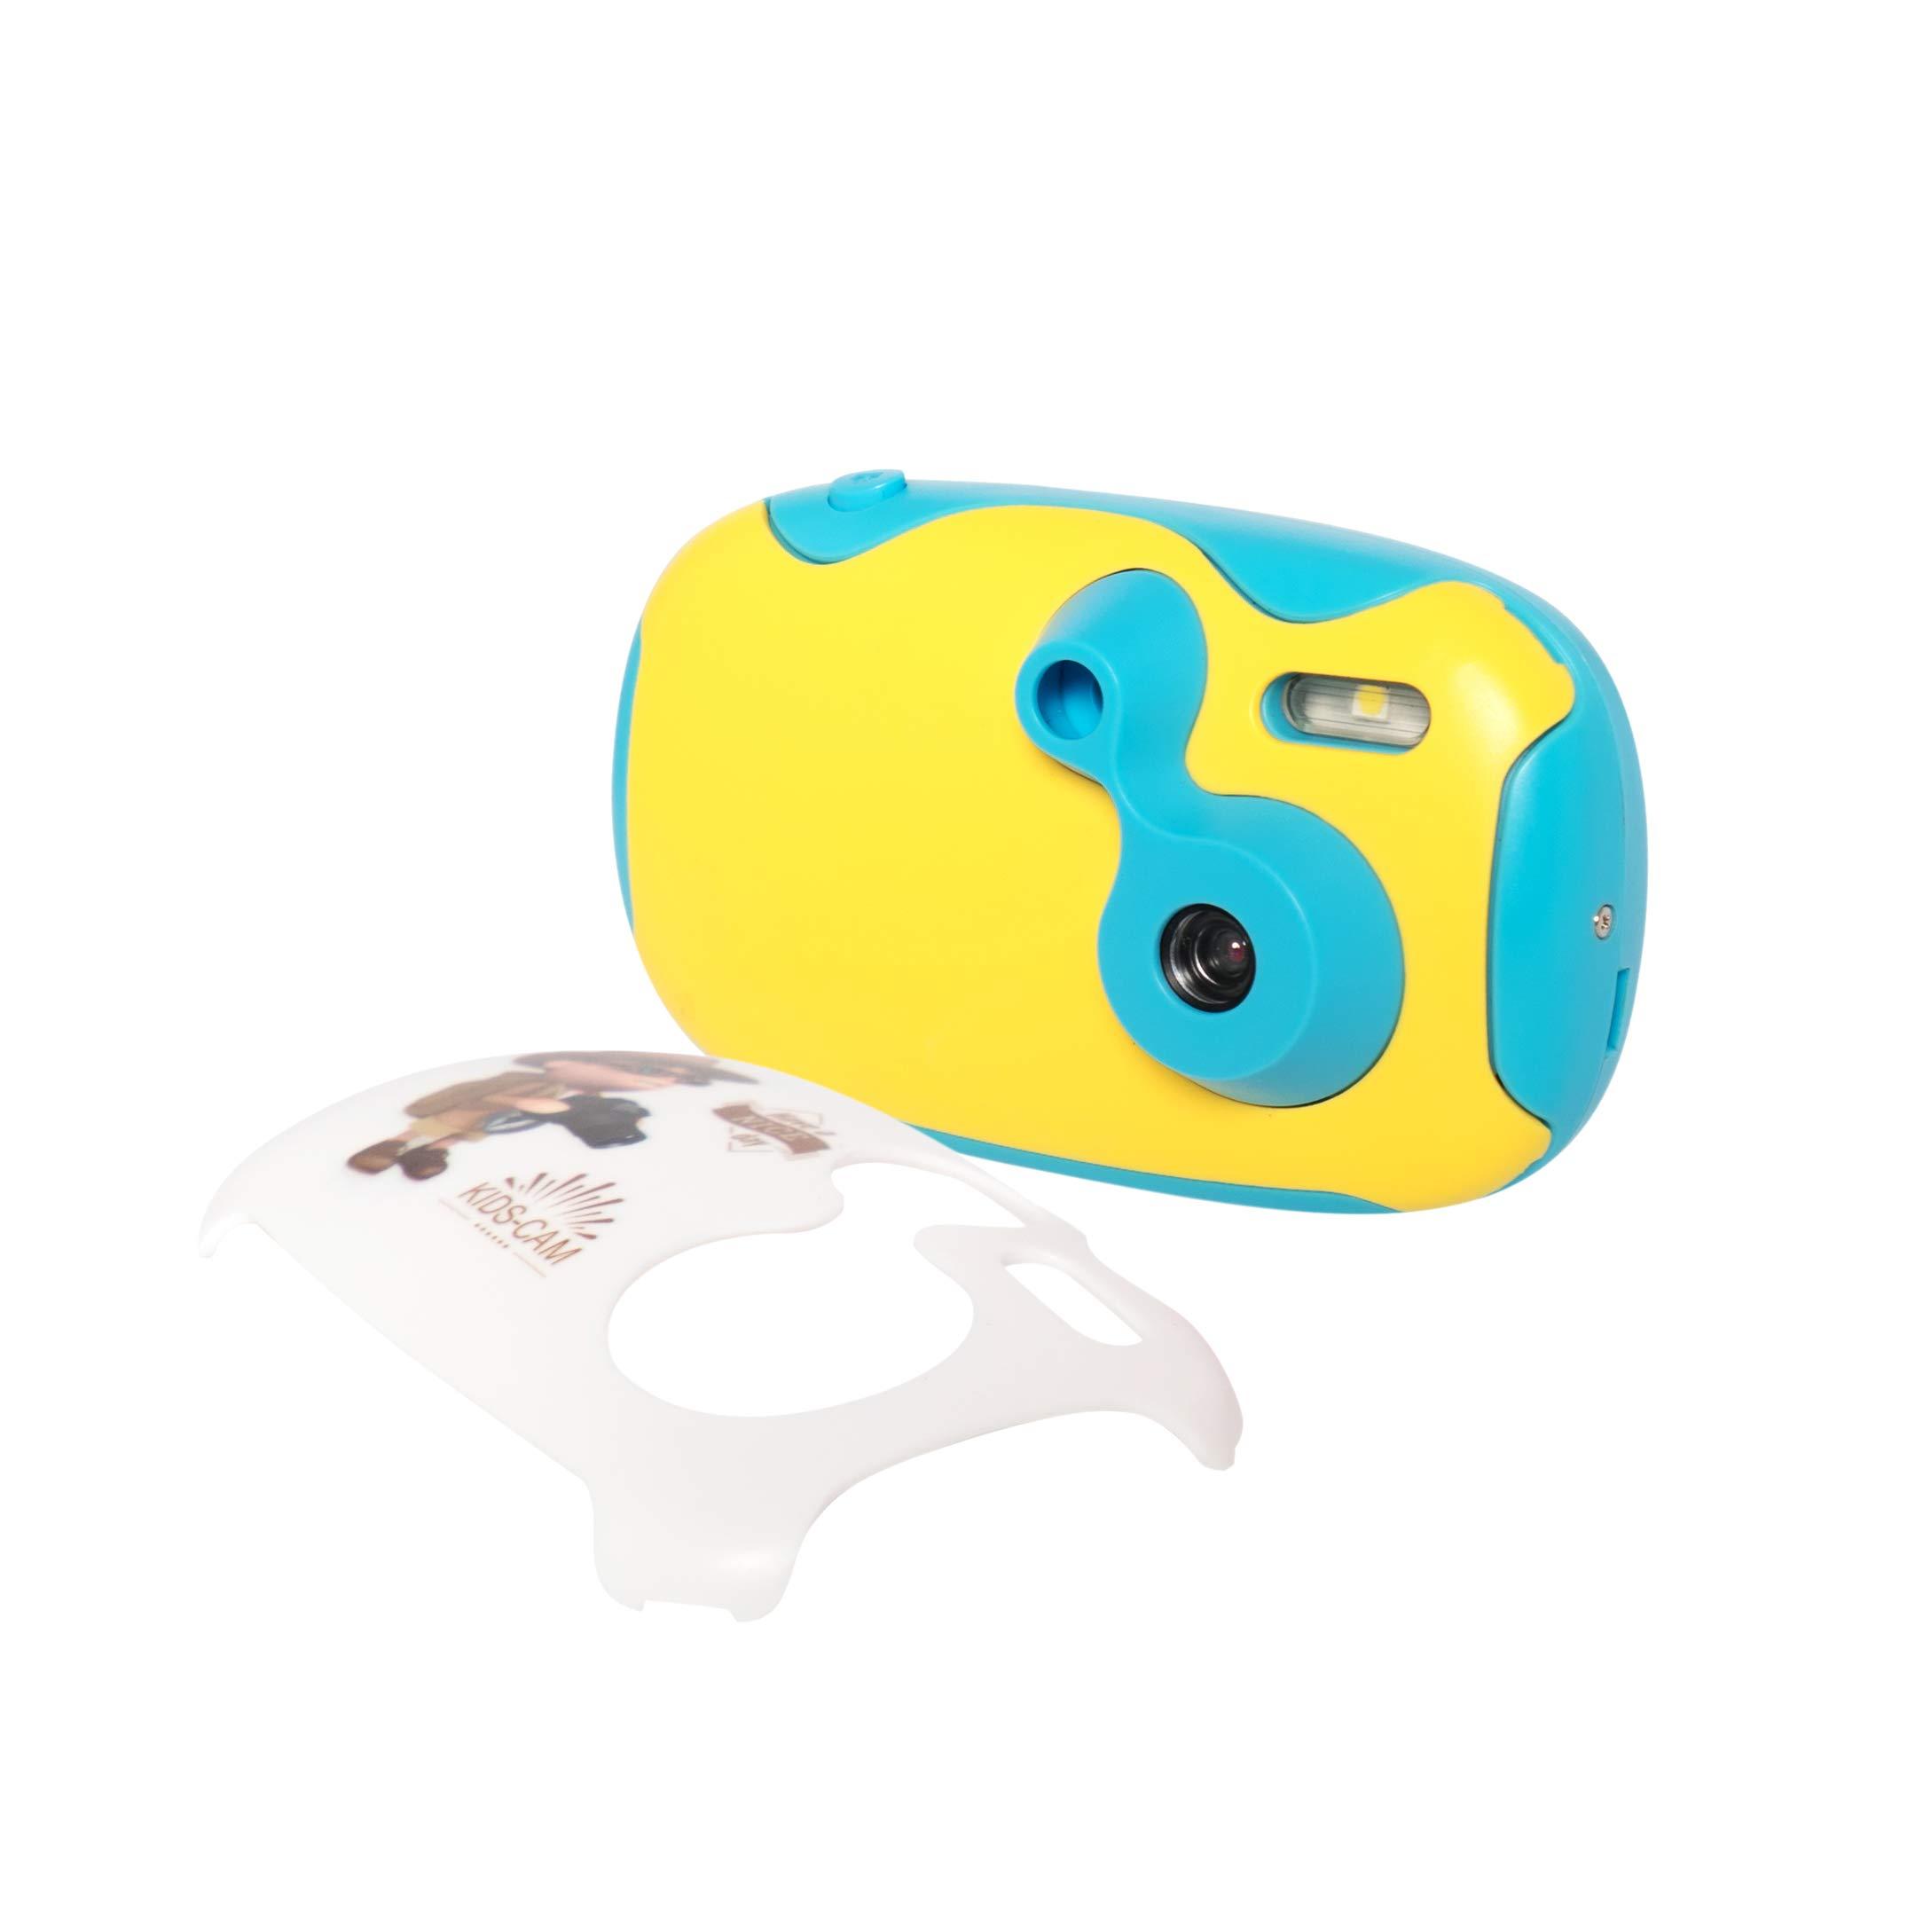 AMKOV DF-02 1.44 inch HD Display Kids Camera, Blue